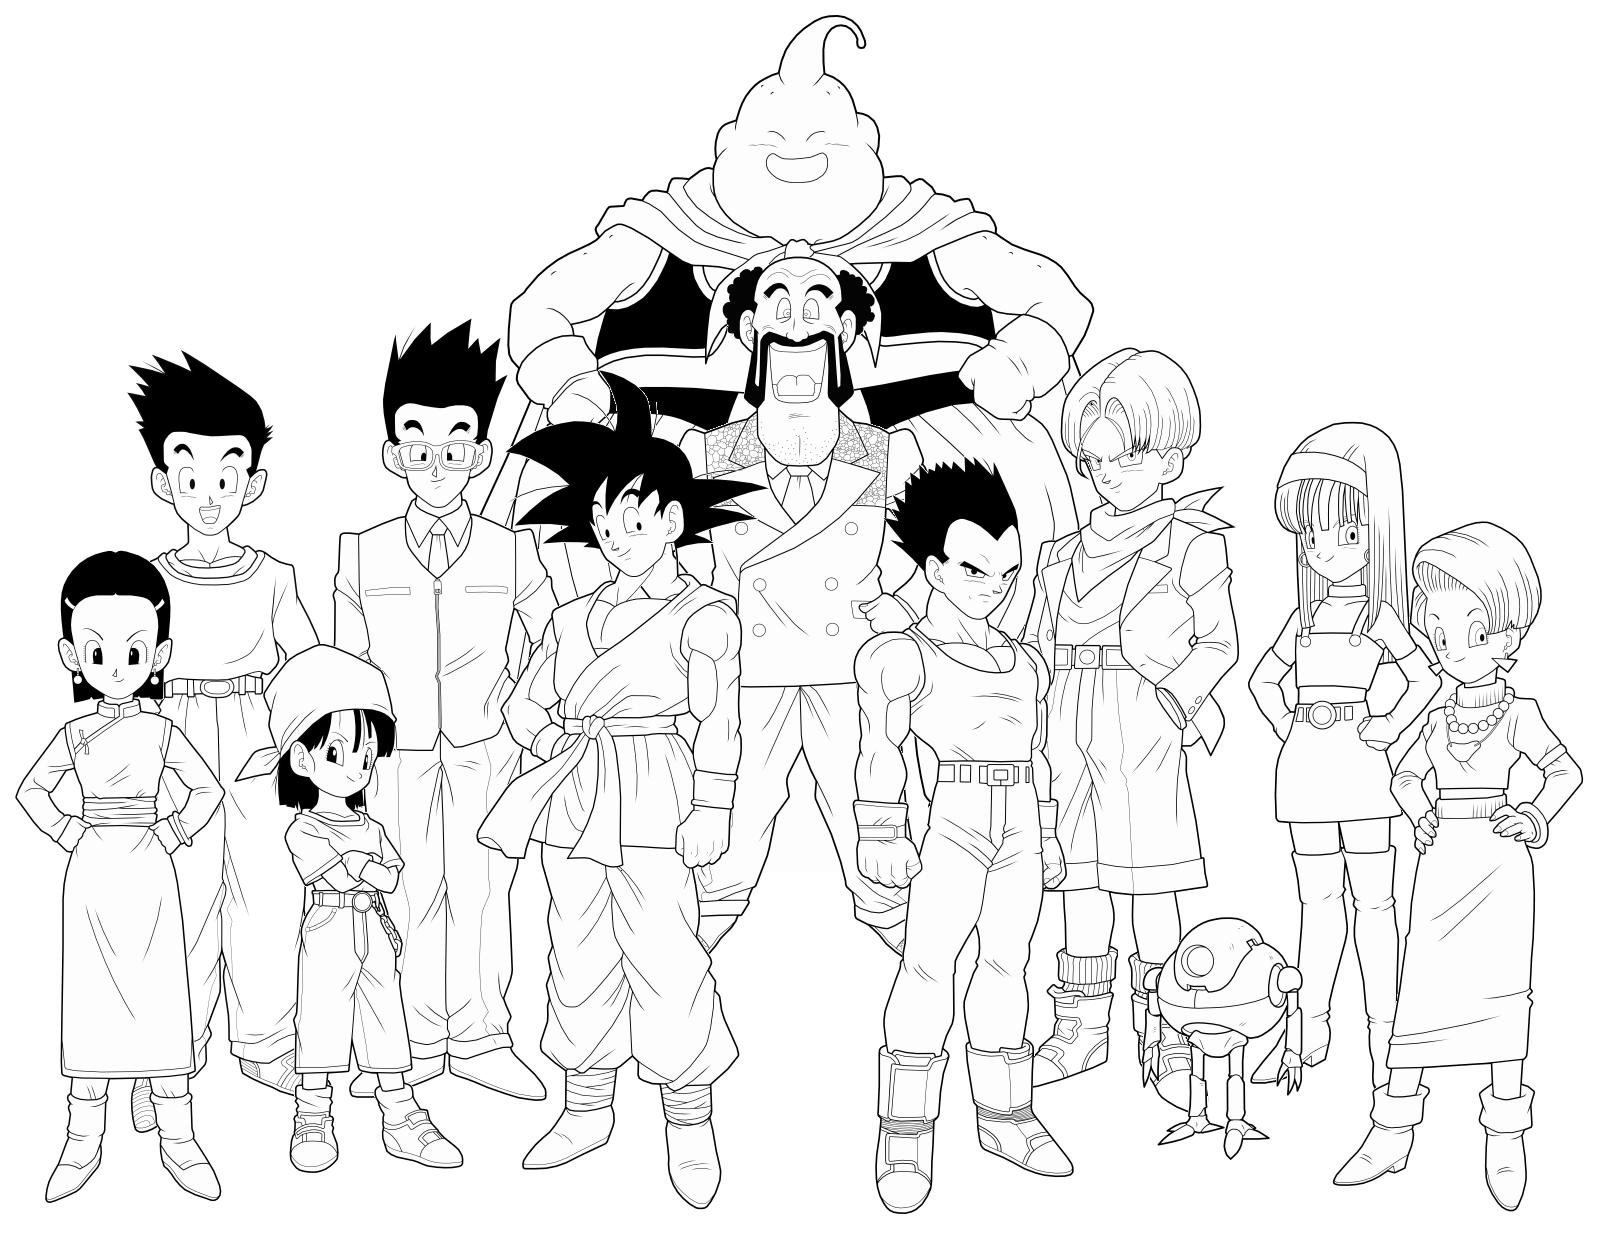 Lo Mejor De Dibujos Para Colorear De Dragon Ball Z Goku Ssj1 ...